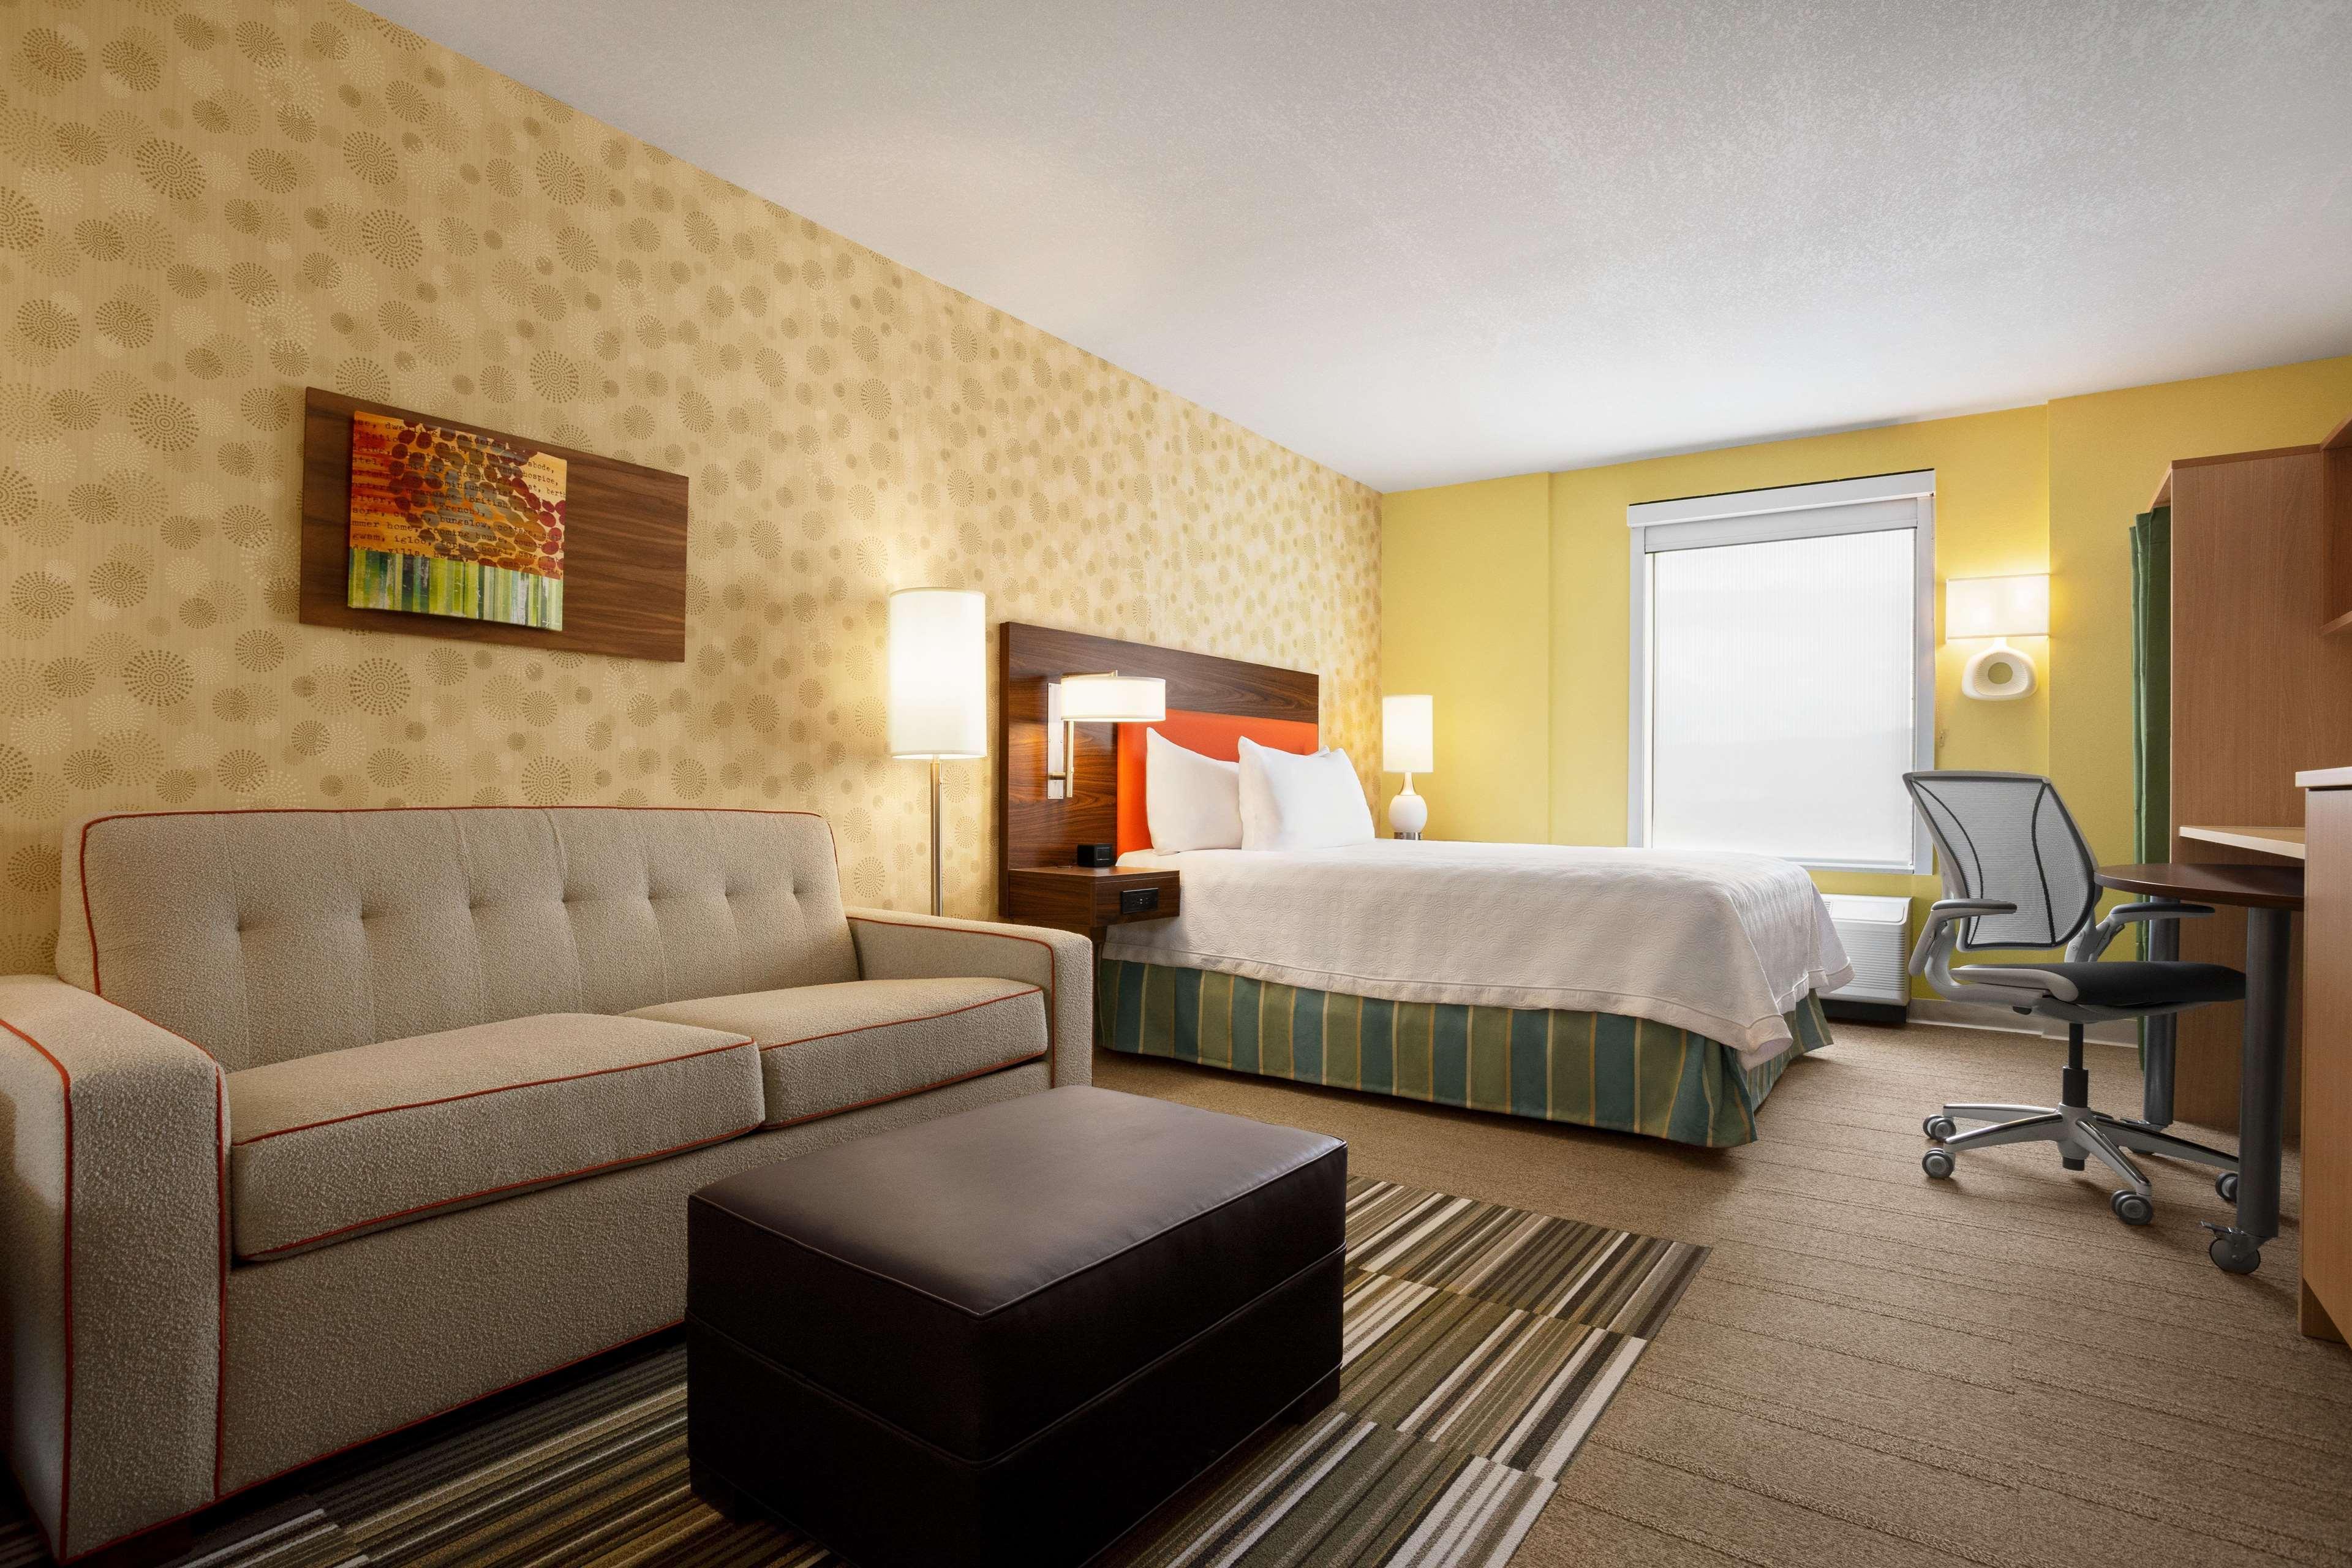 Home2 Suites by Hilton Elko image 19